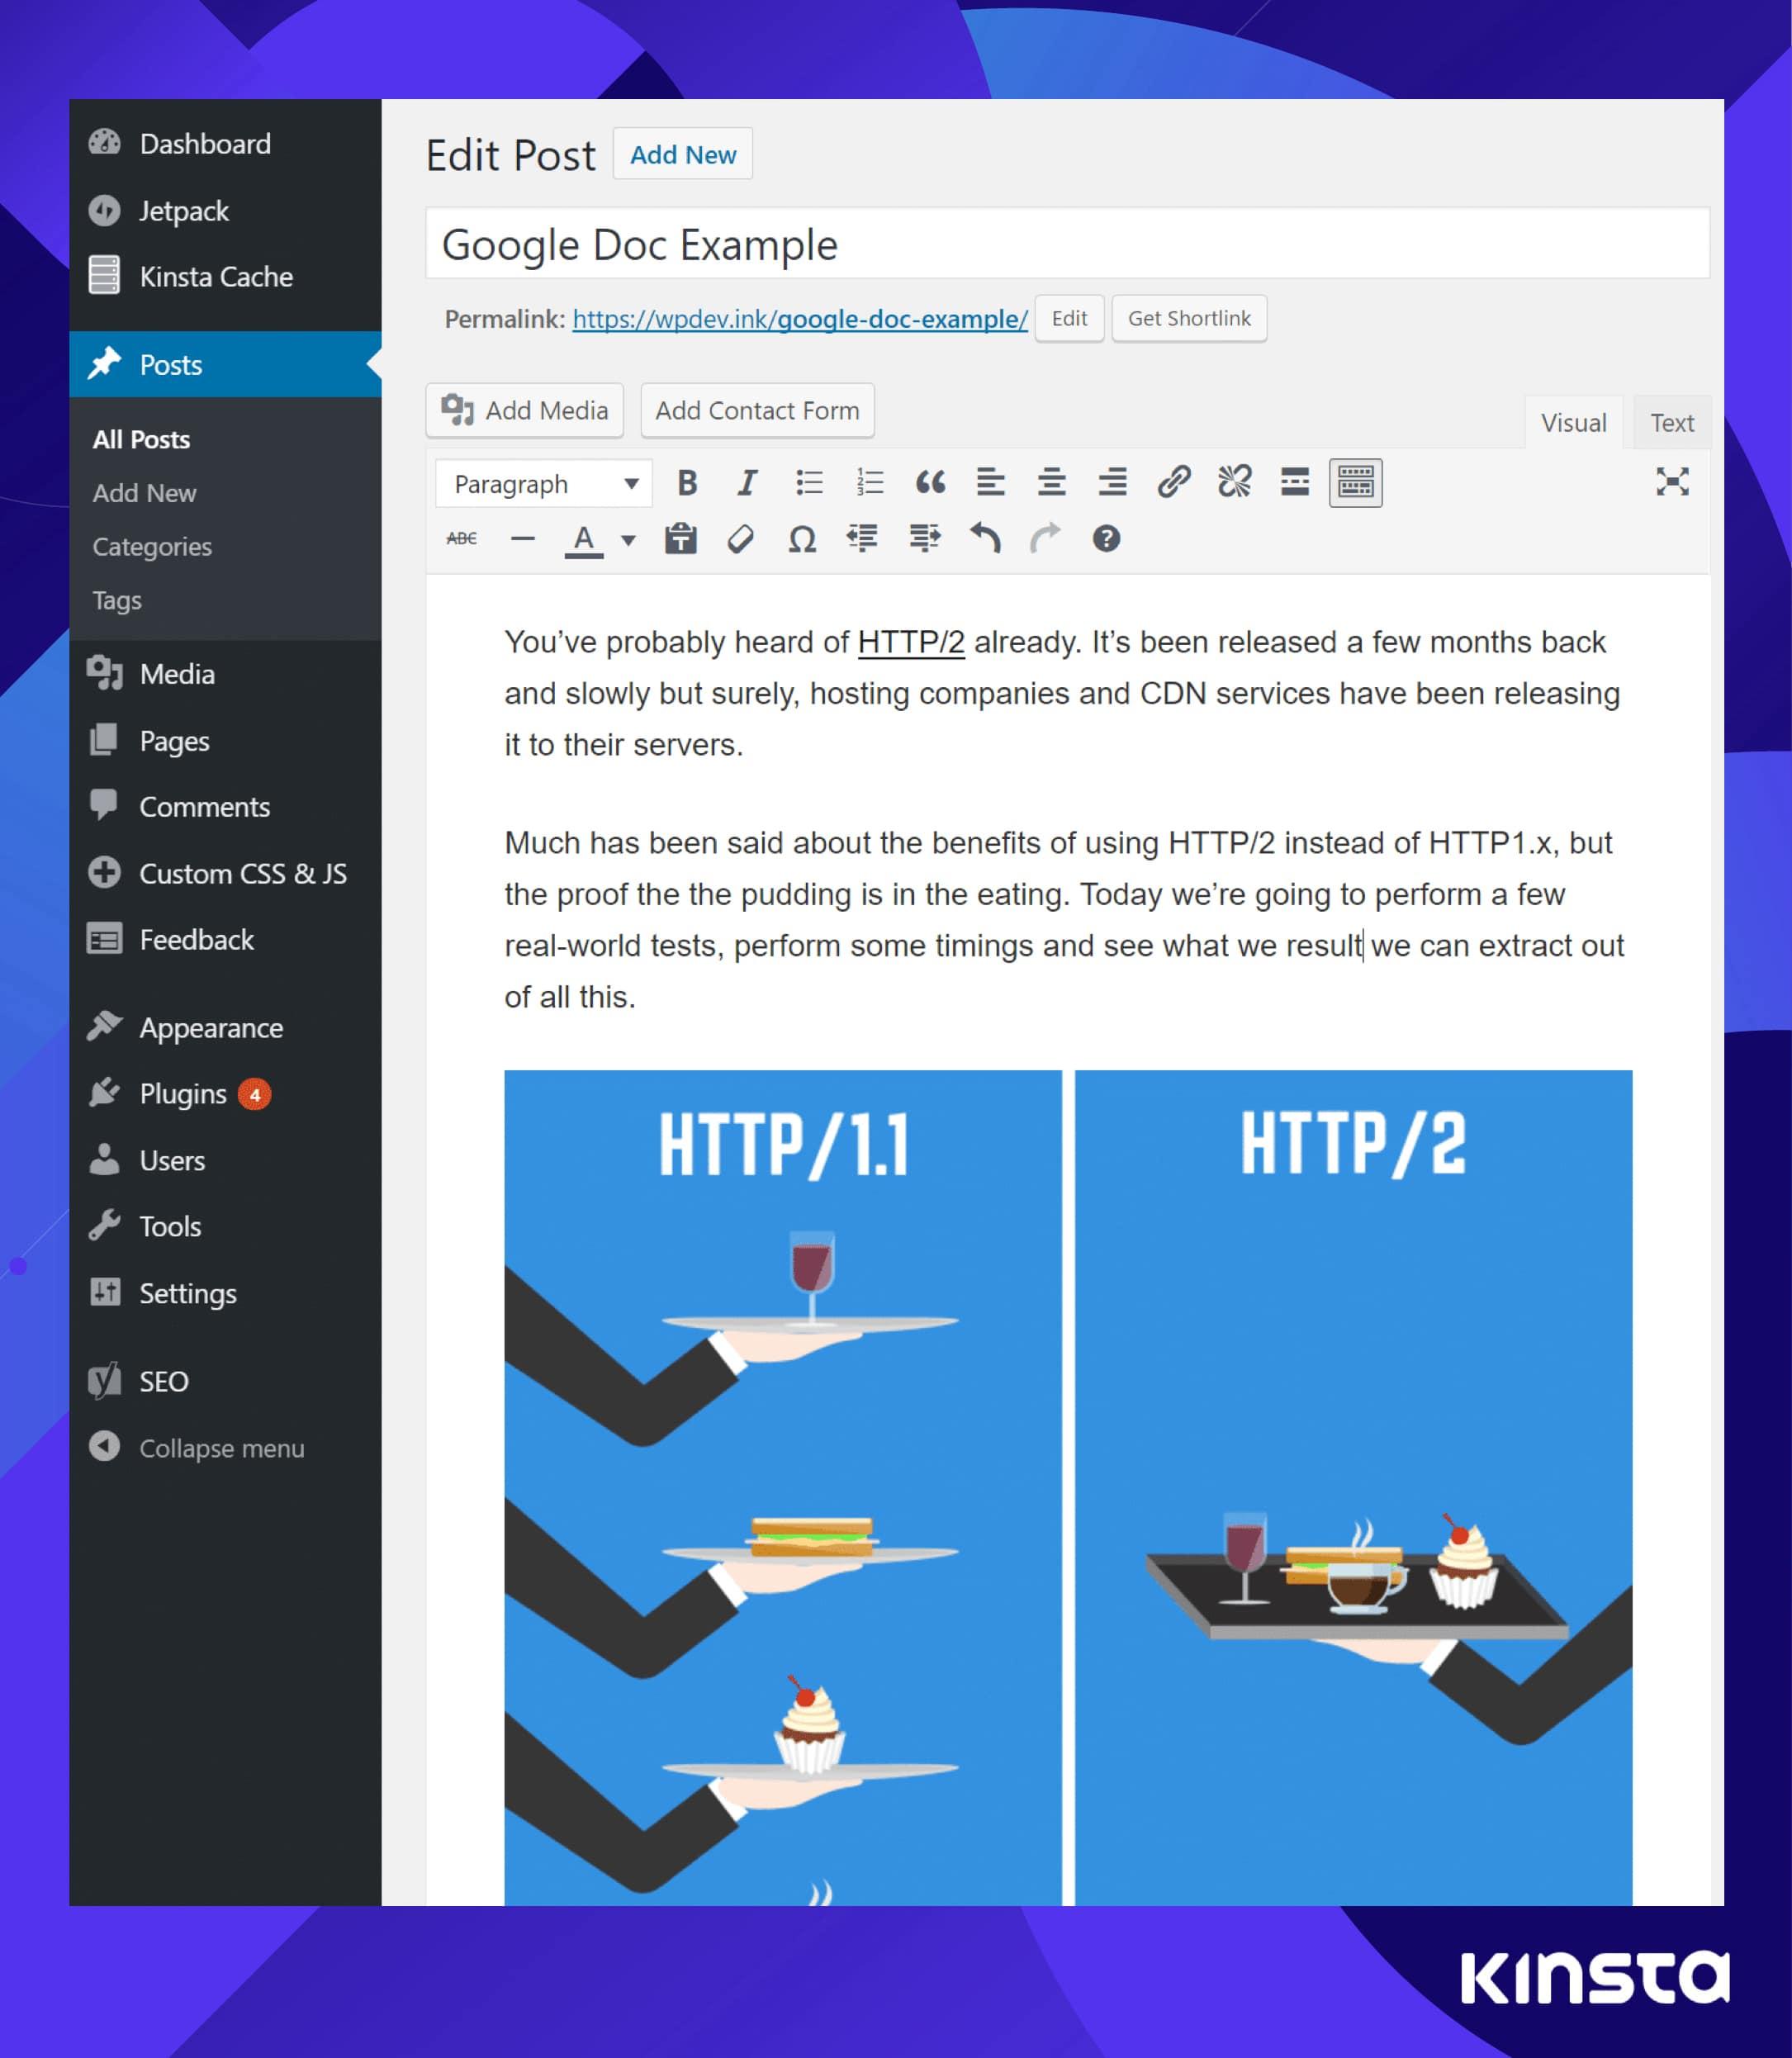 Google Docs Jetpack example